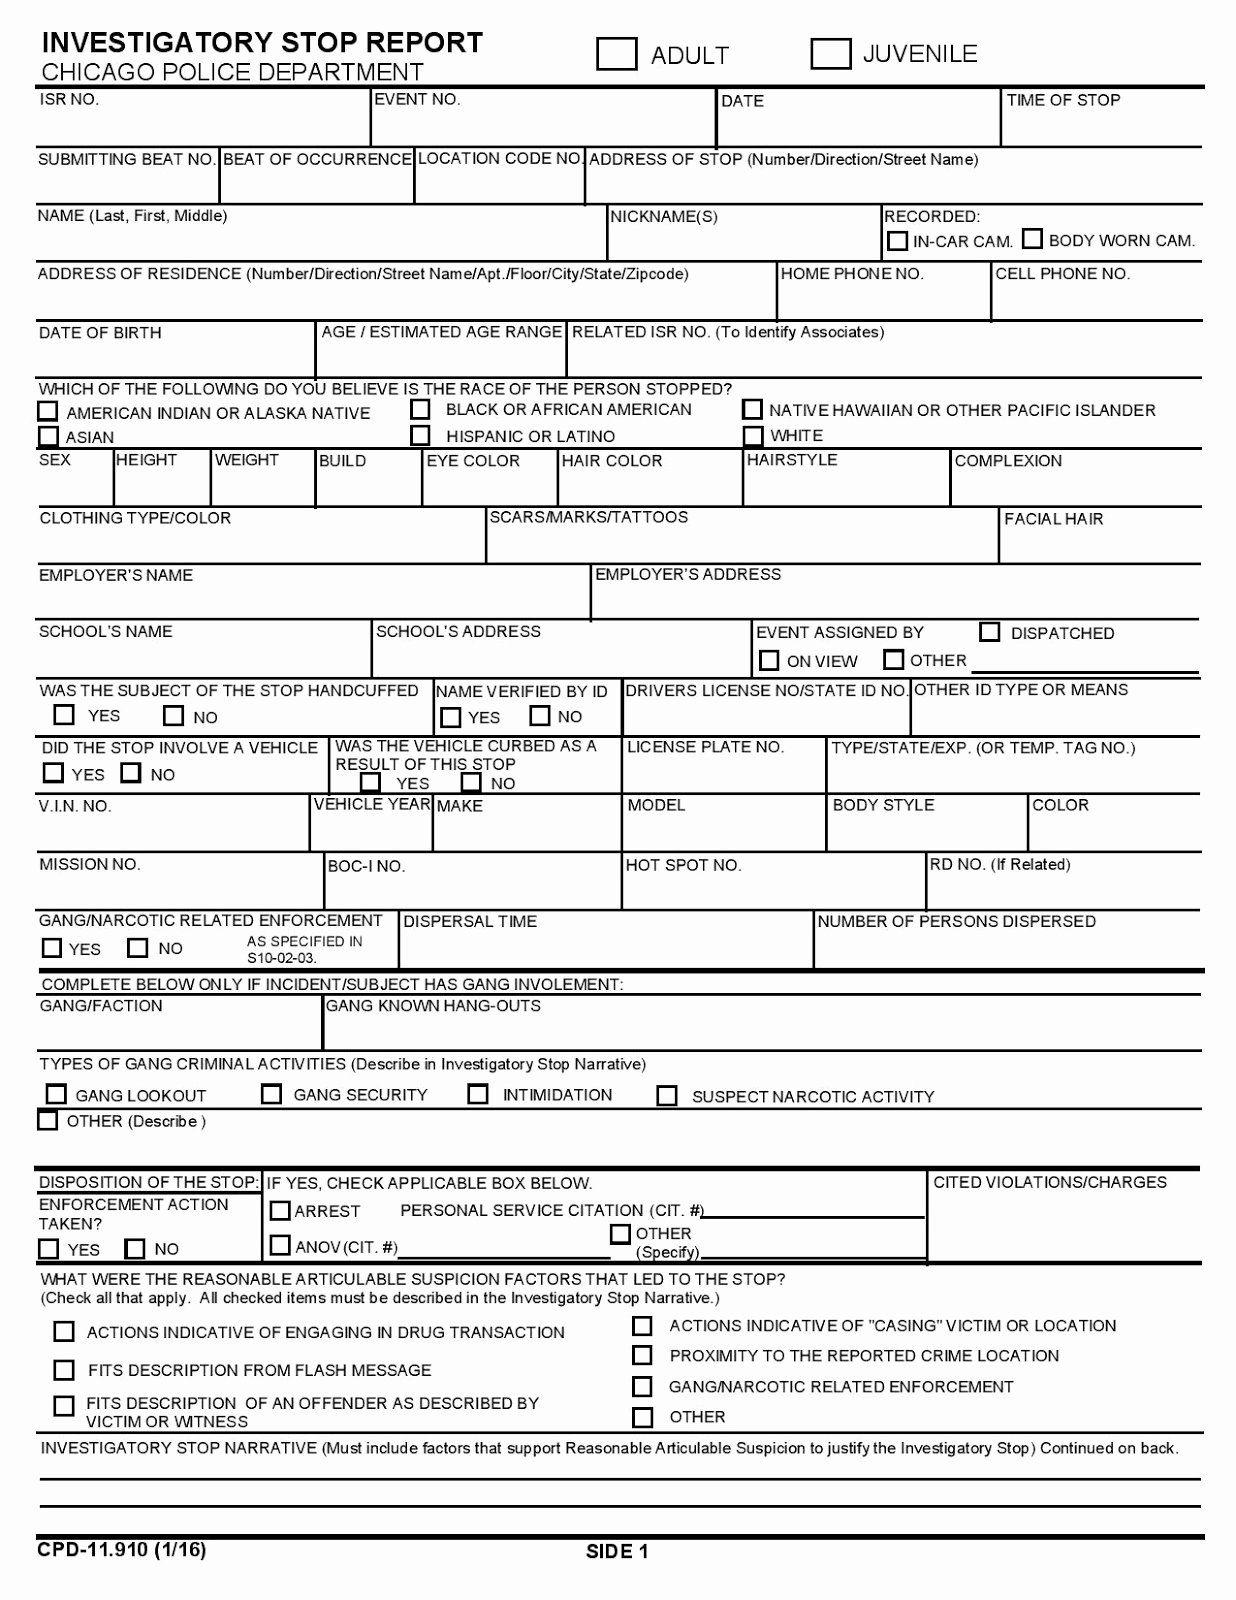 Police Arrest Report Template In 2020 Ticket Template Blank